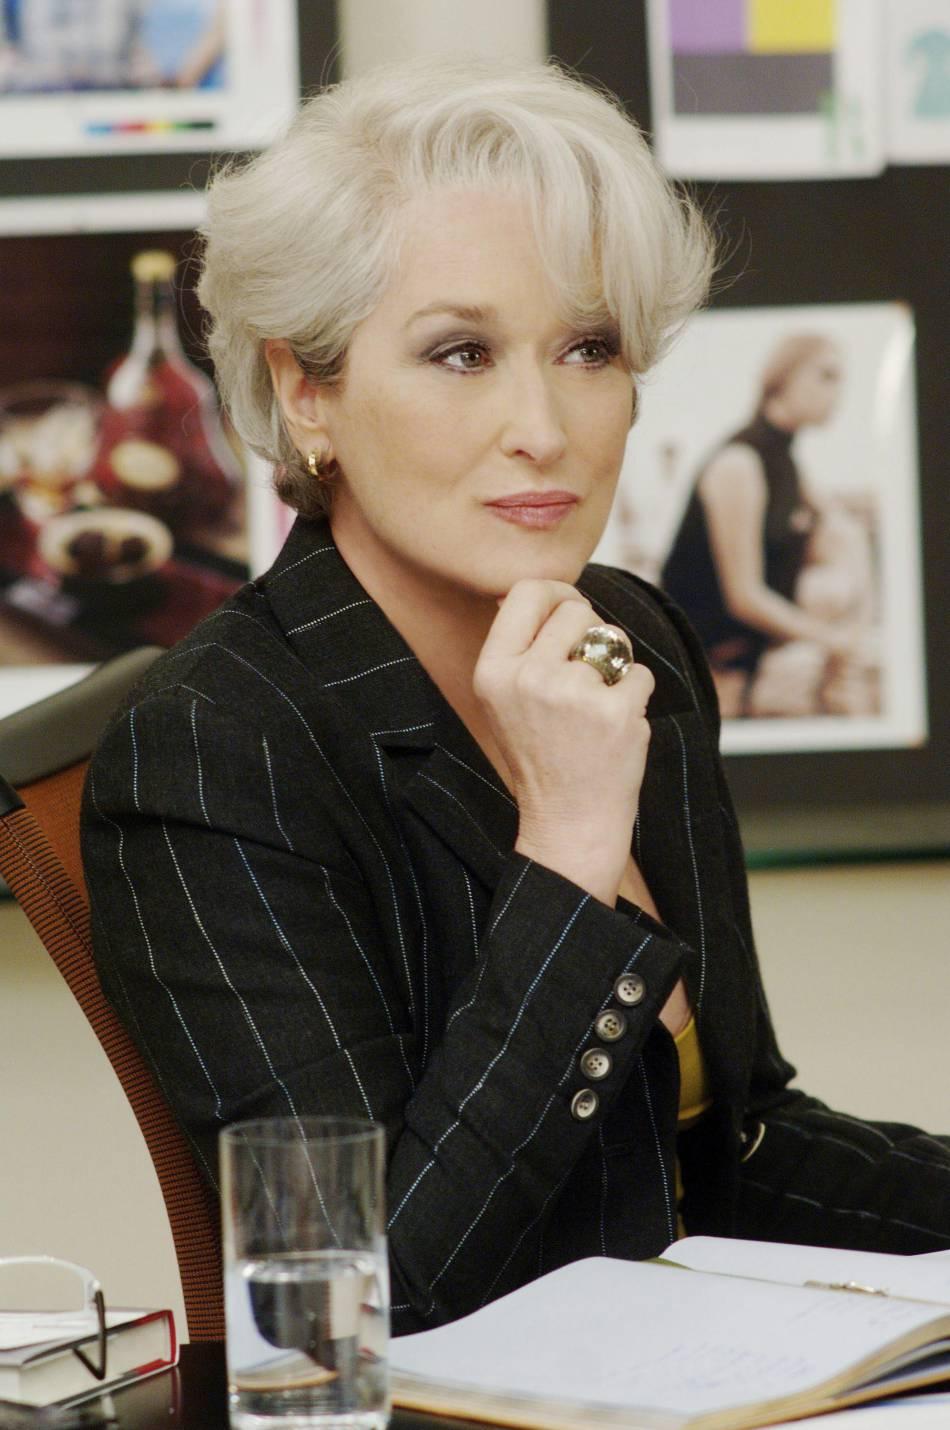 Le Diable S'habille En Prada 2 : diable, s'habille, prada, Meryl, Streep, Porte, Bijoux, Swarovski, Diable, S'habille, Prada, Puretrend